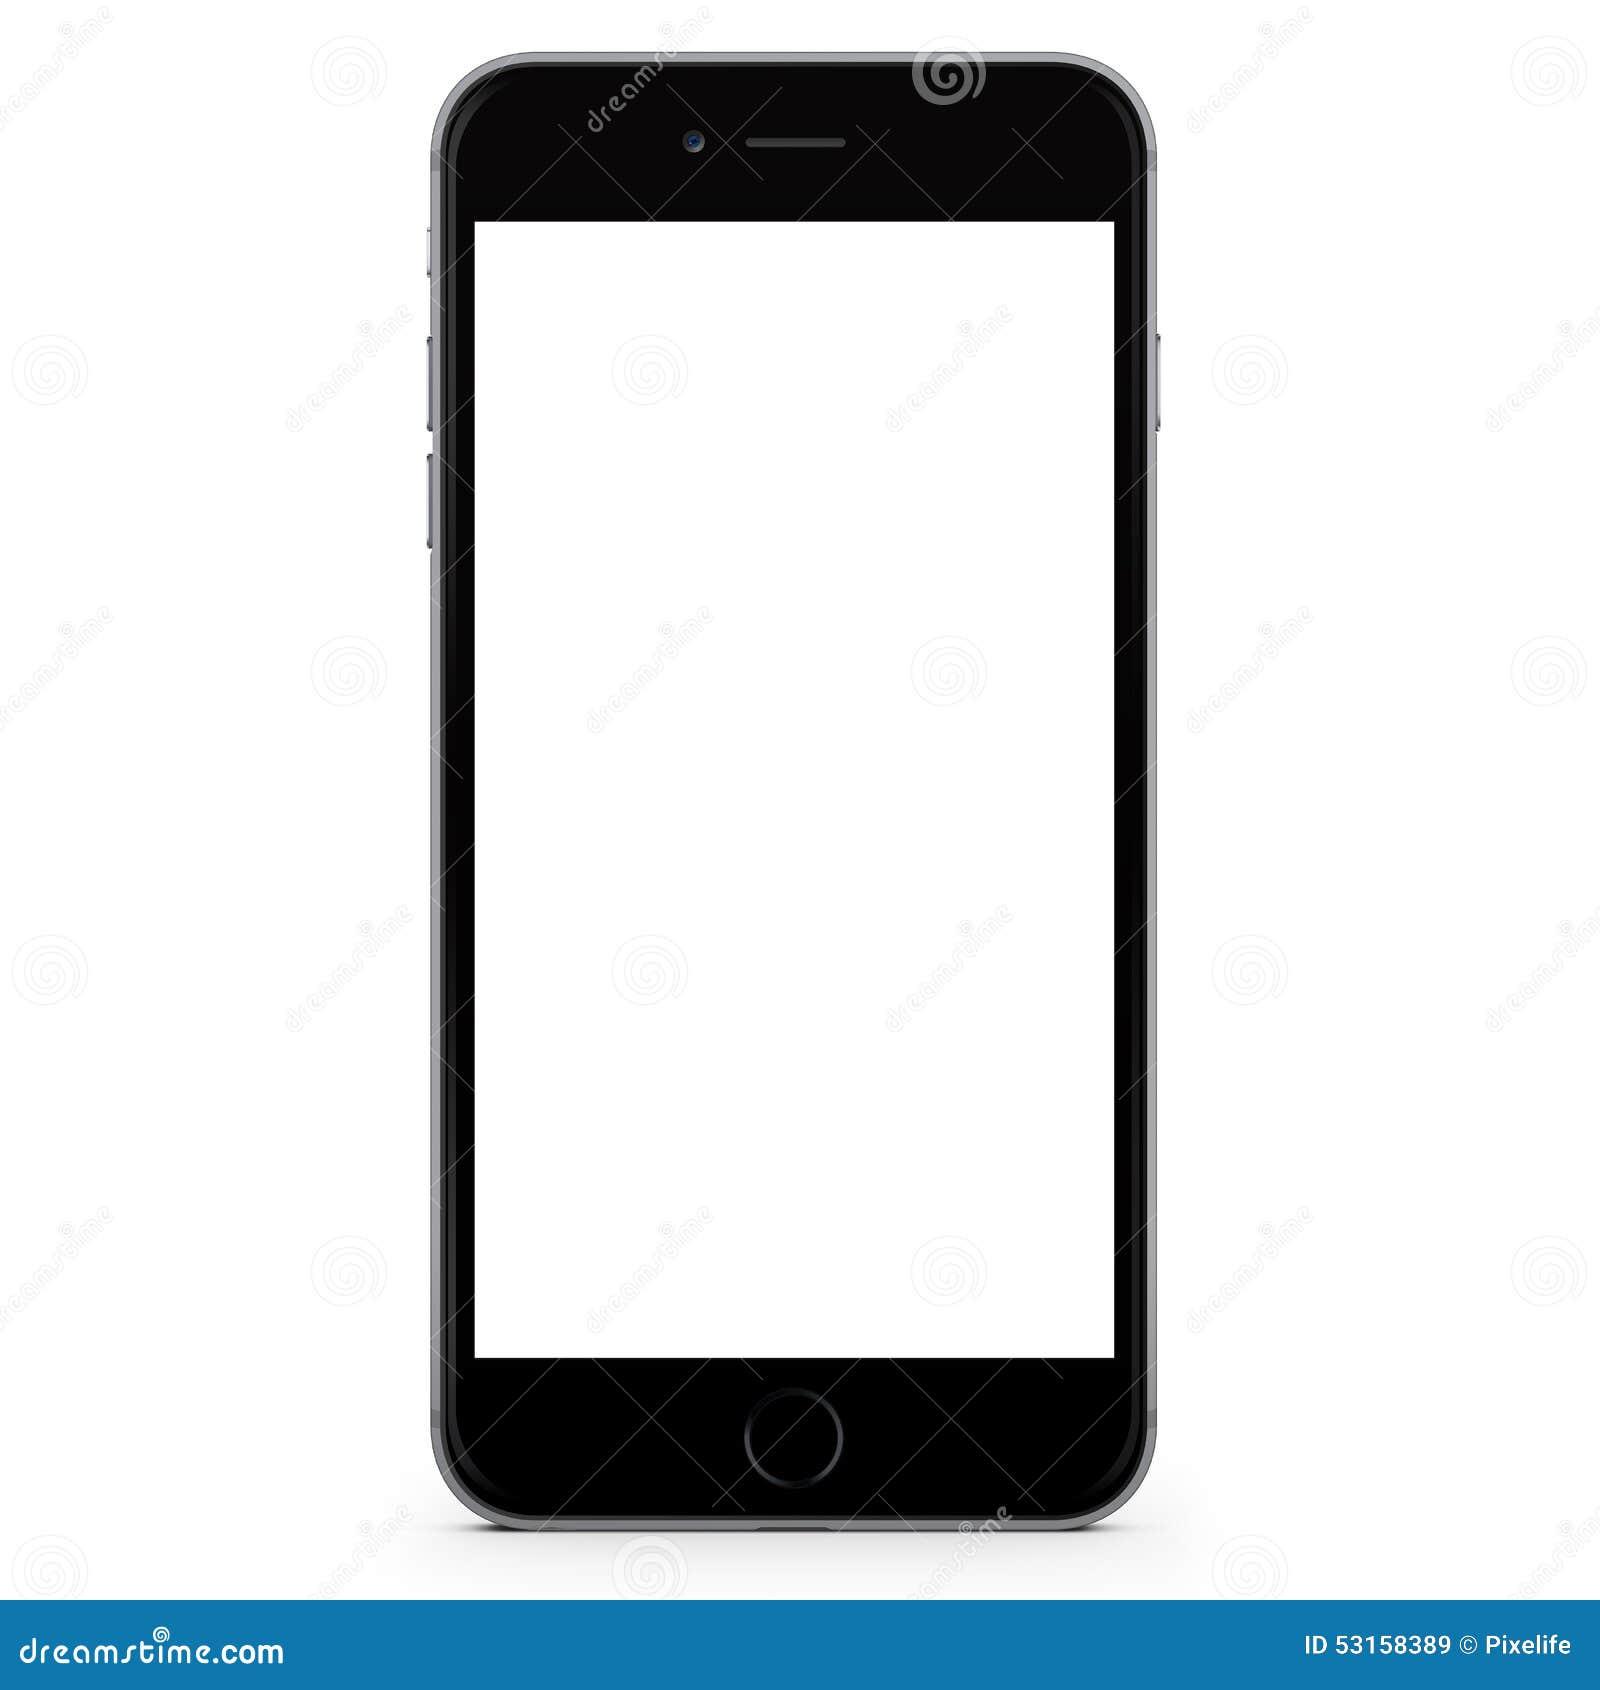 No Credit Iphone